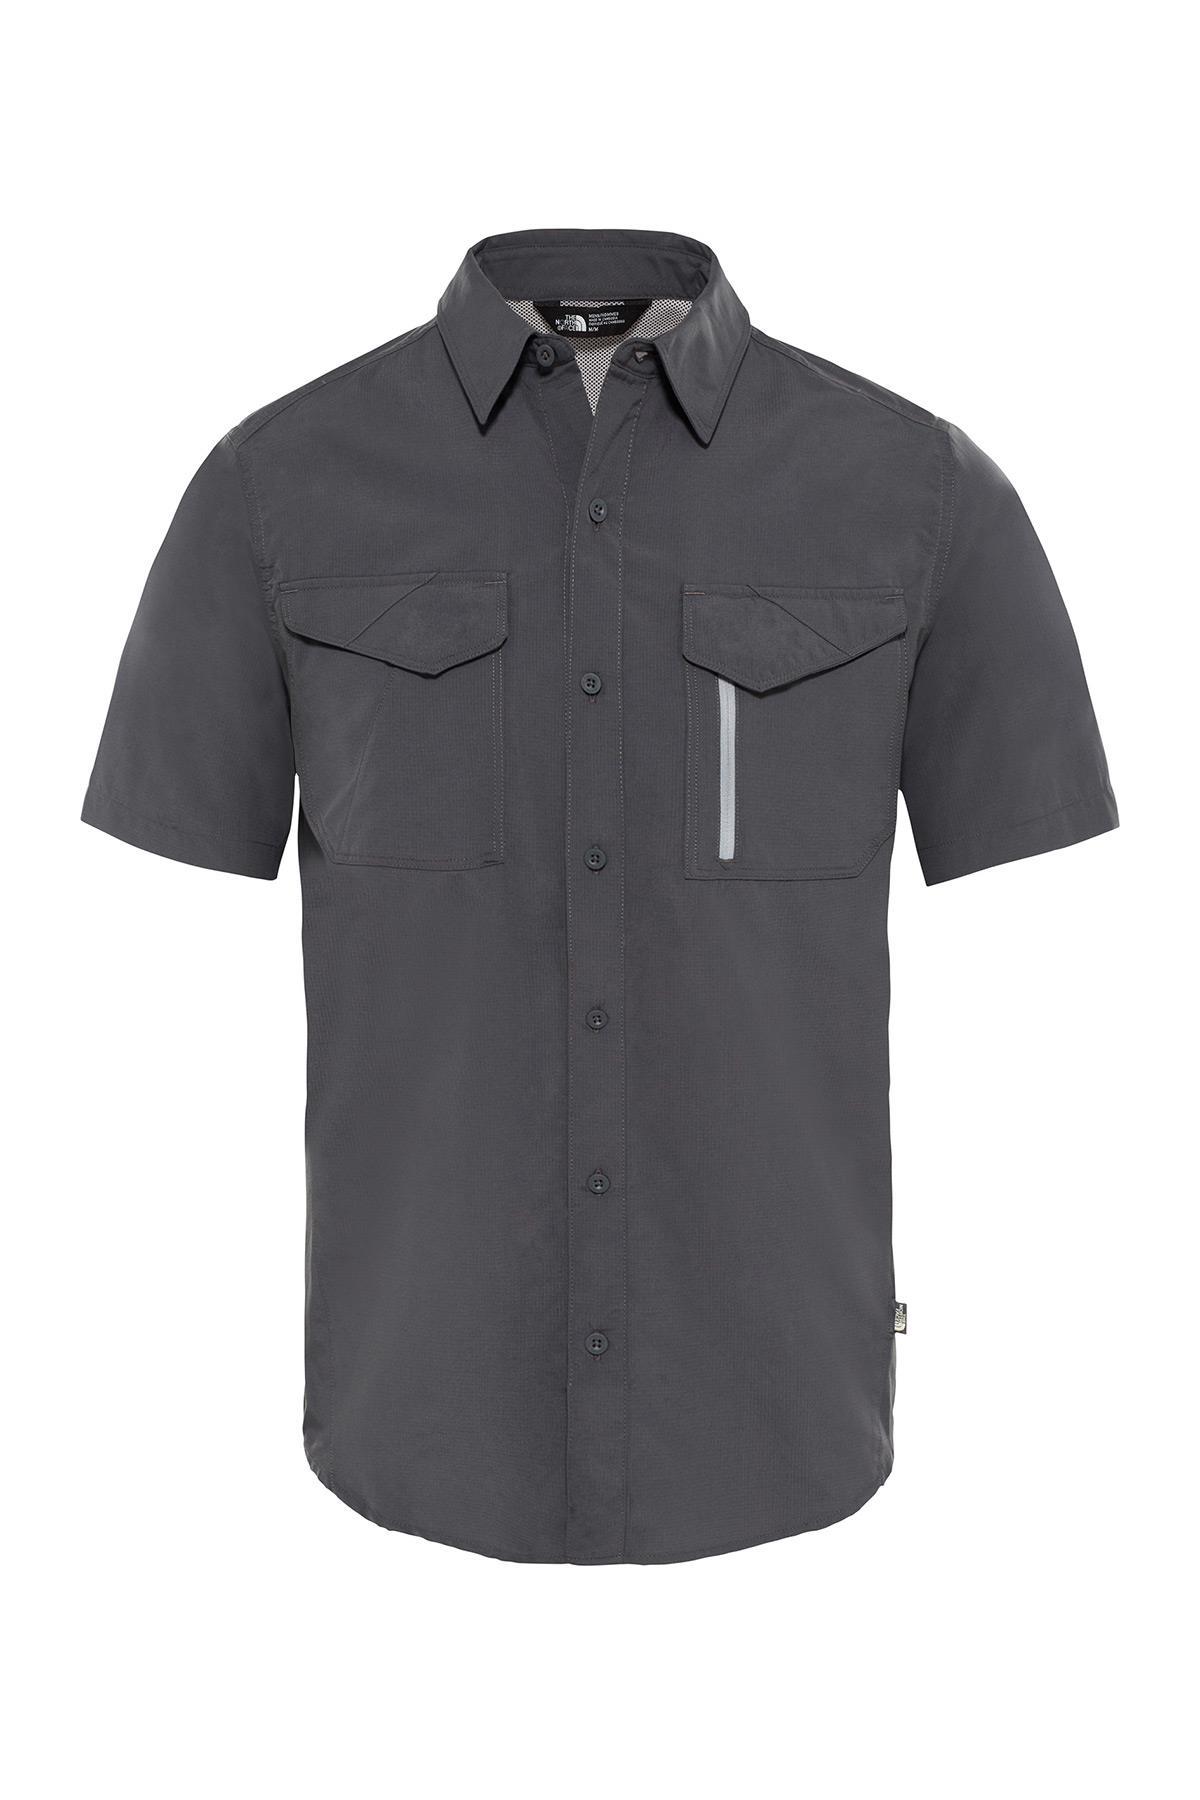 The Northface Erkek S/S Sequoia Shirt-Eu T92Xjxagb Gömlek